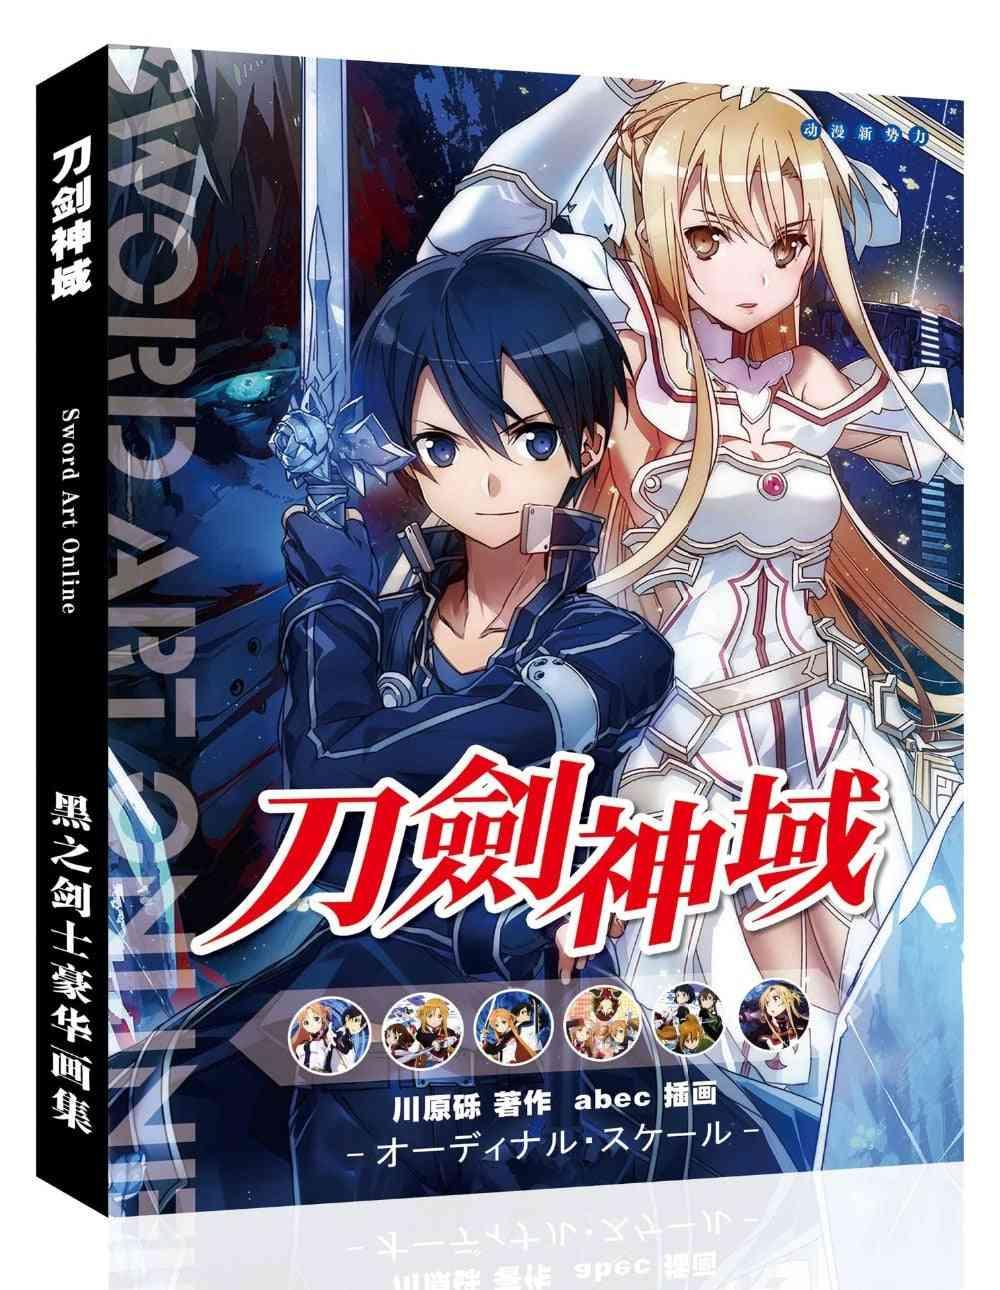 Sword Online Sao Art Book Kirito